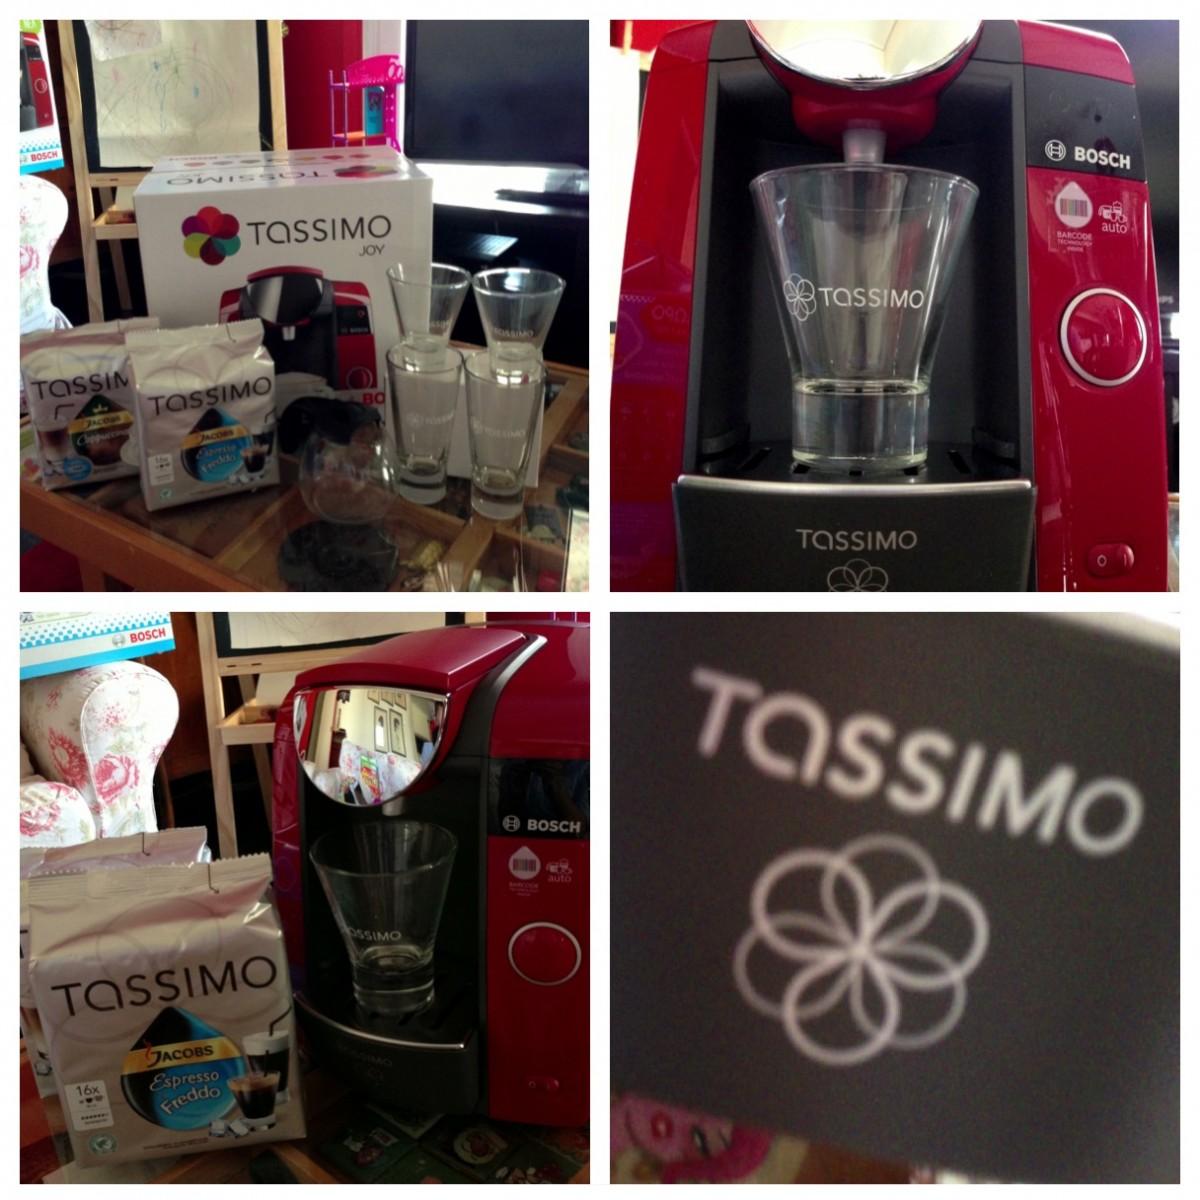 Tassimo Joy: ένα σύστημα ροφημάτων όμορφο, πρακτικό και… οικογενειακό!